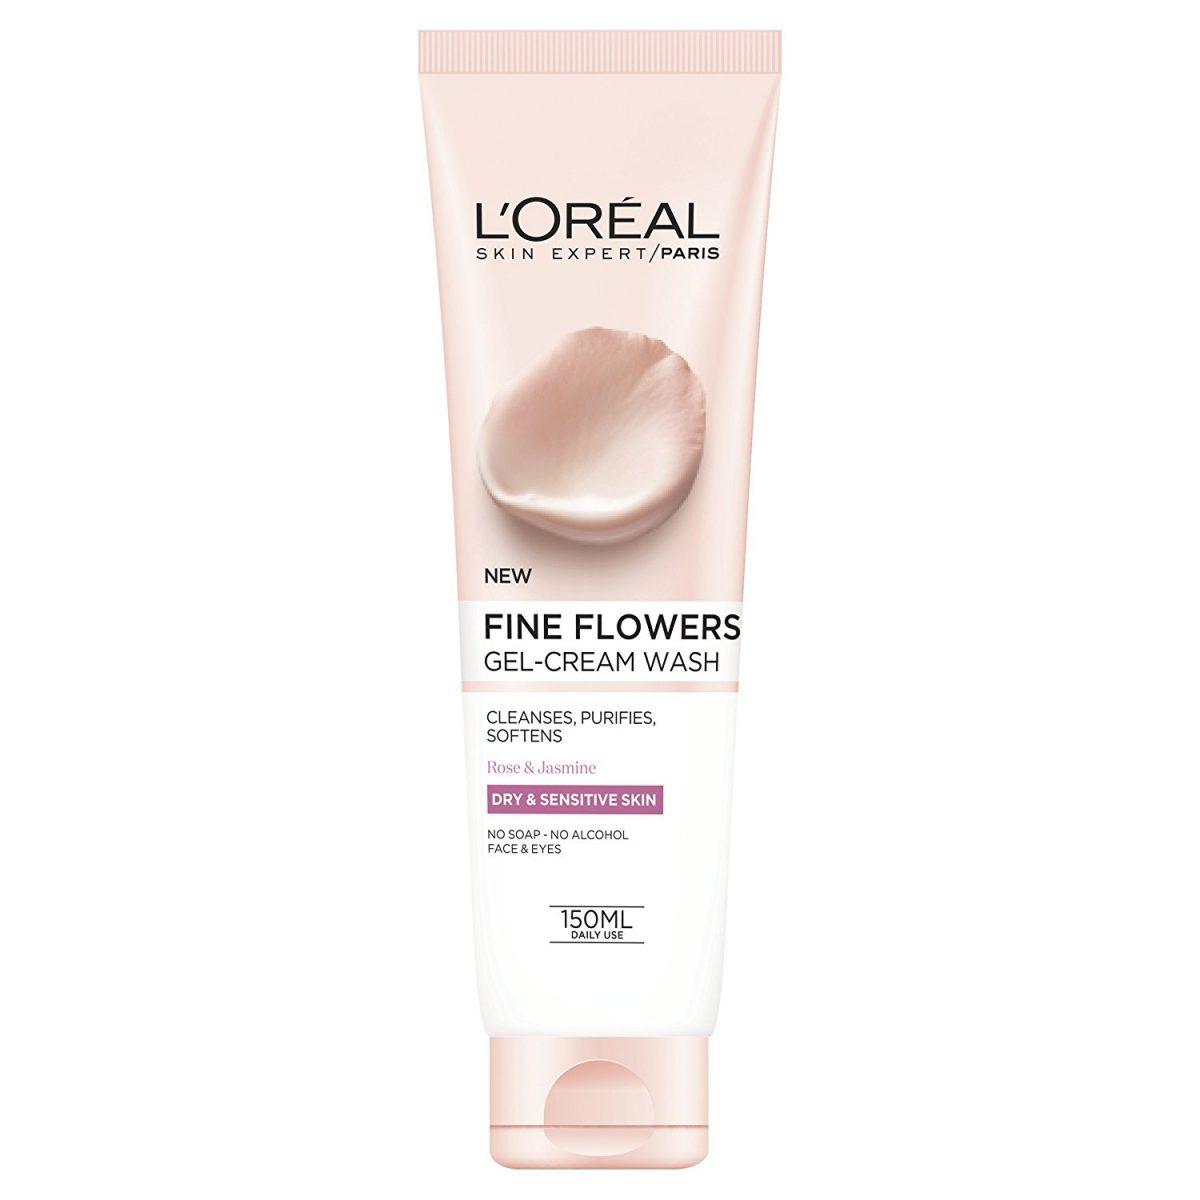 Loreal Fine Flowers Gel Cream Wash Bangladesh